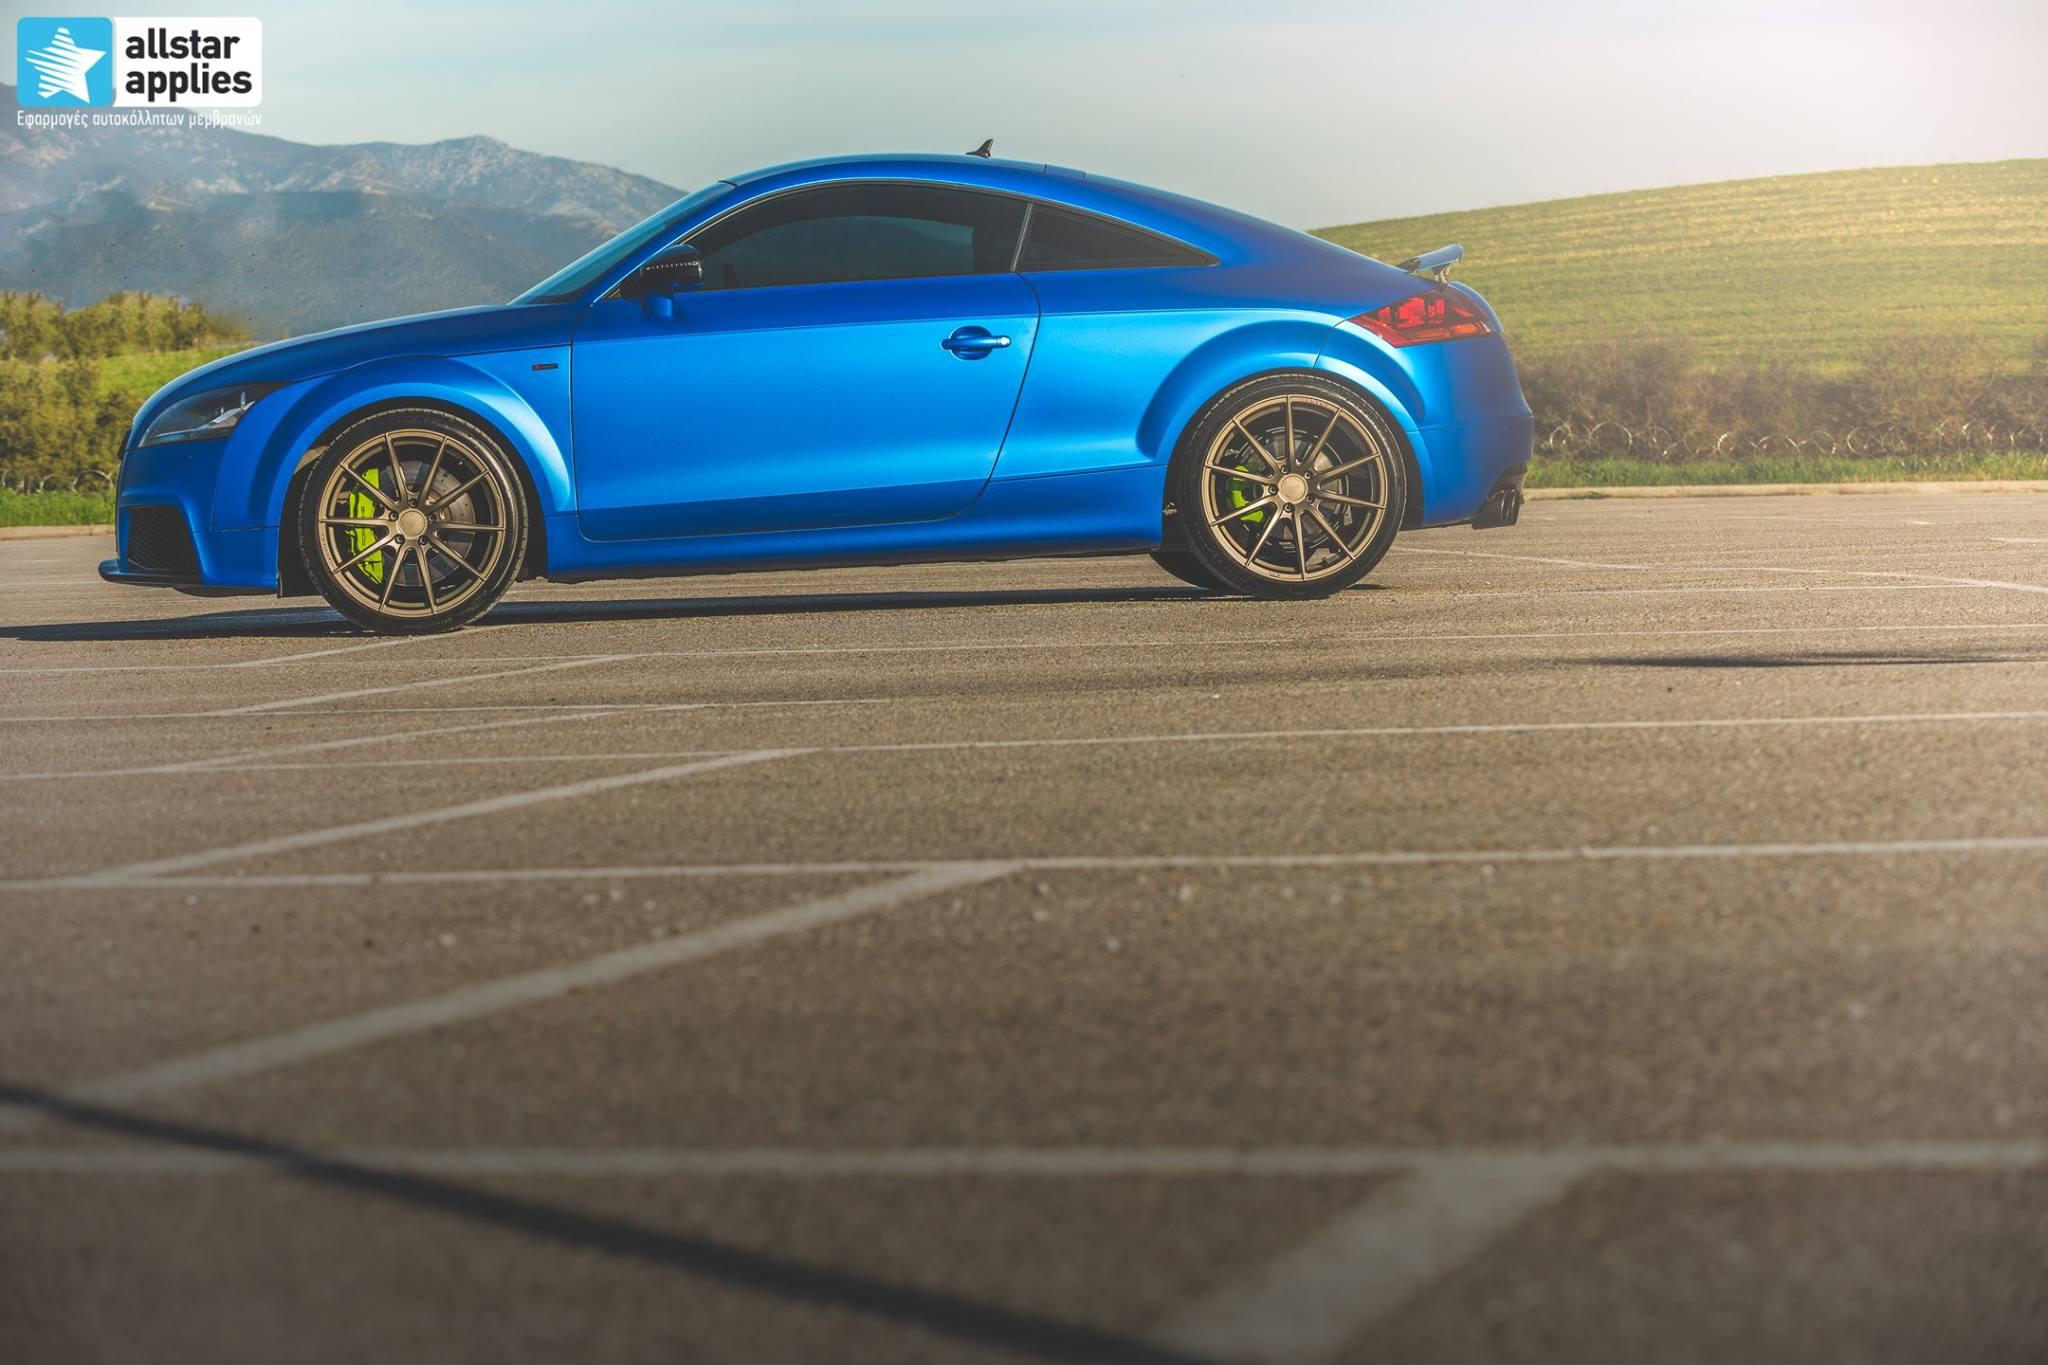 Audi TT - Matte Iced Blue + Ispiri Wheels FFR1 Matte (10)